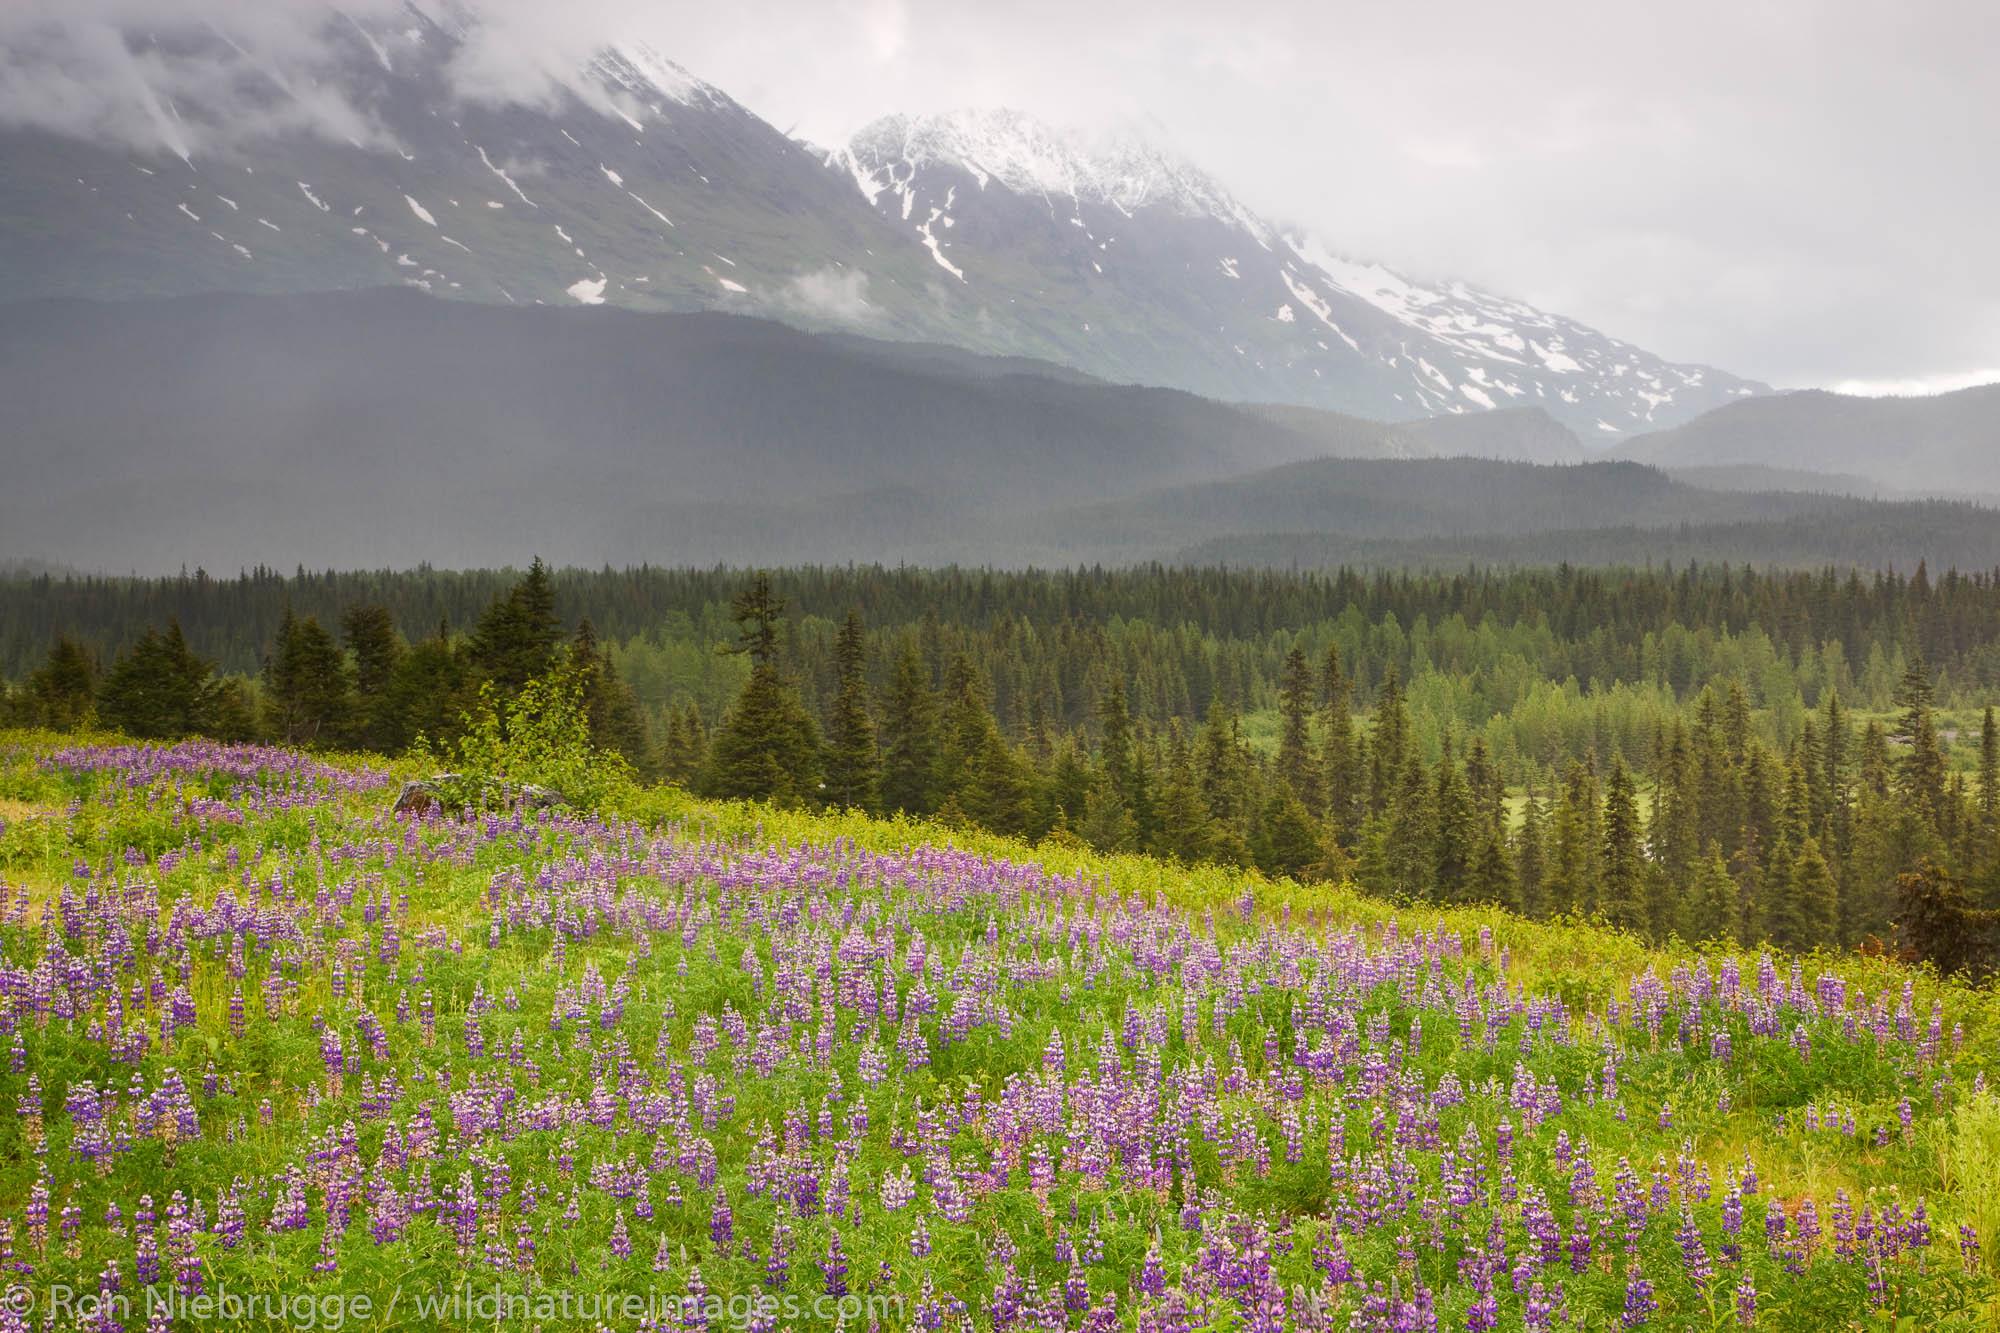 A field of lupine near Paradise Valley, Chugach National Forest, near Seward, Alaska.